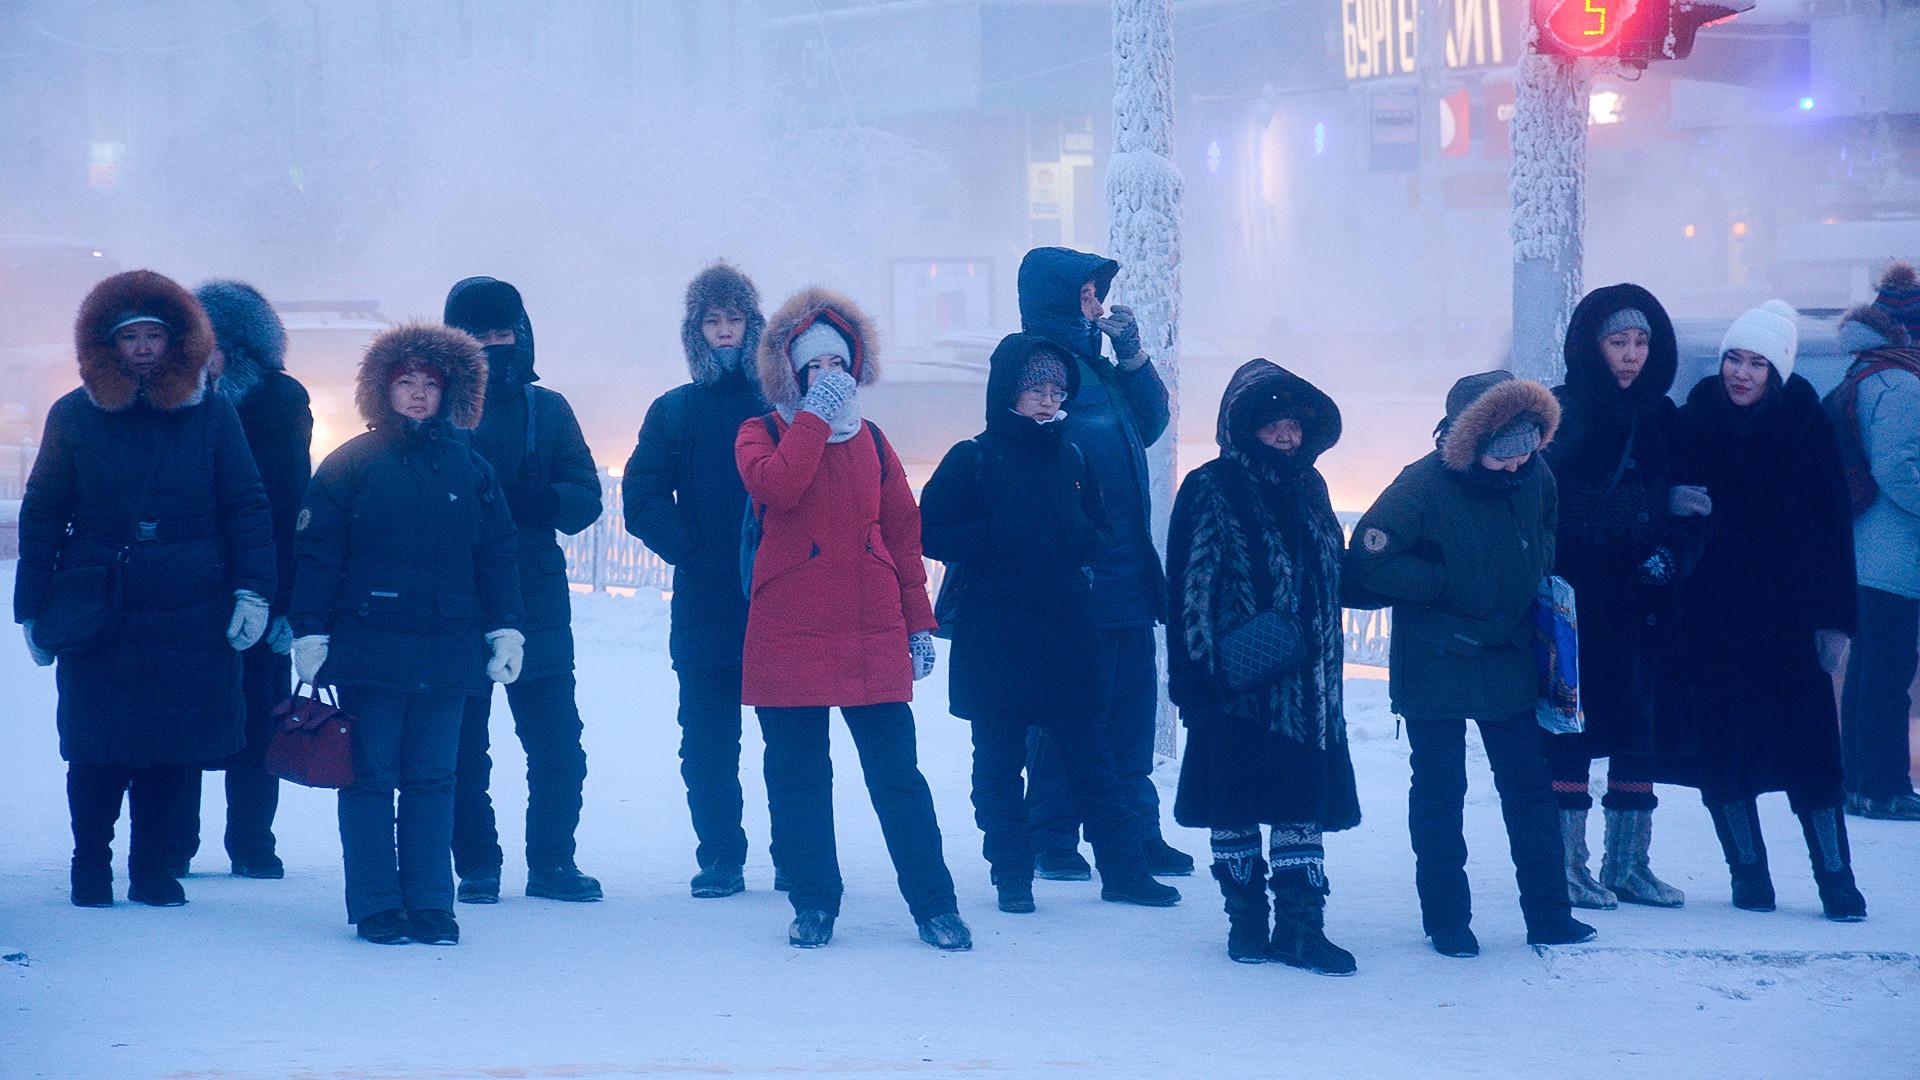 Yakutsk, the temperature outside is minus 47 degrees.